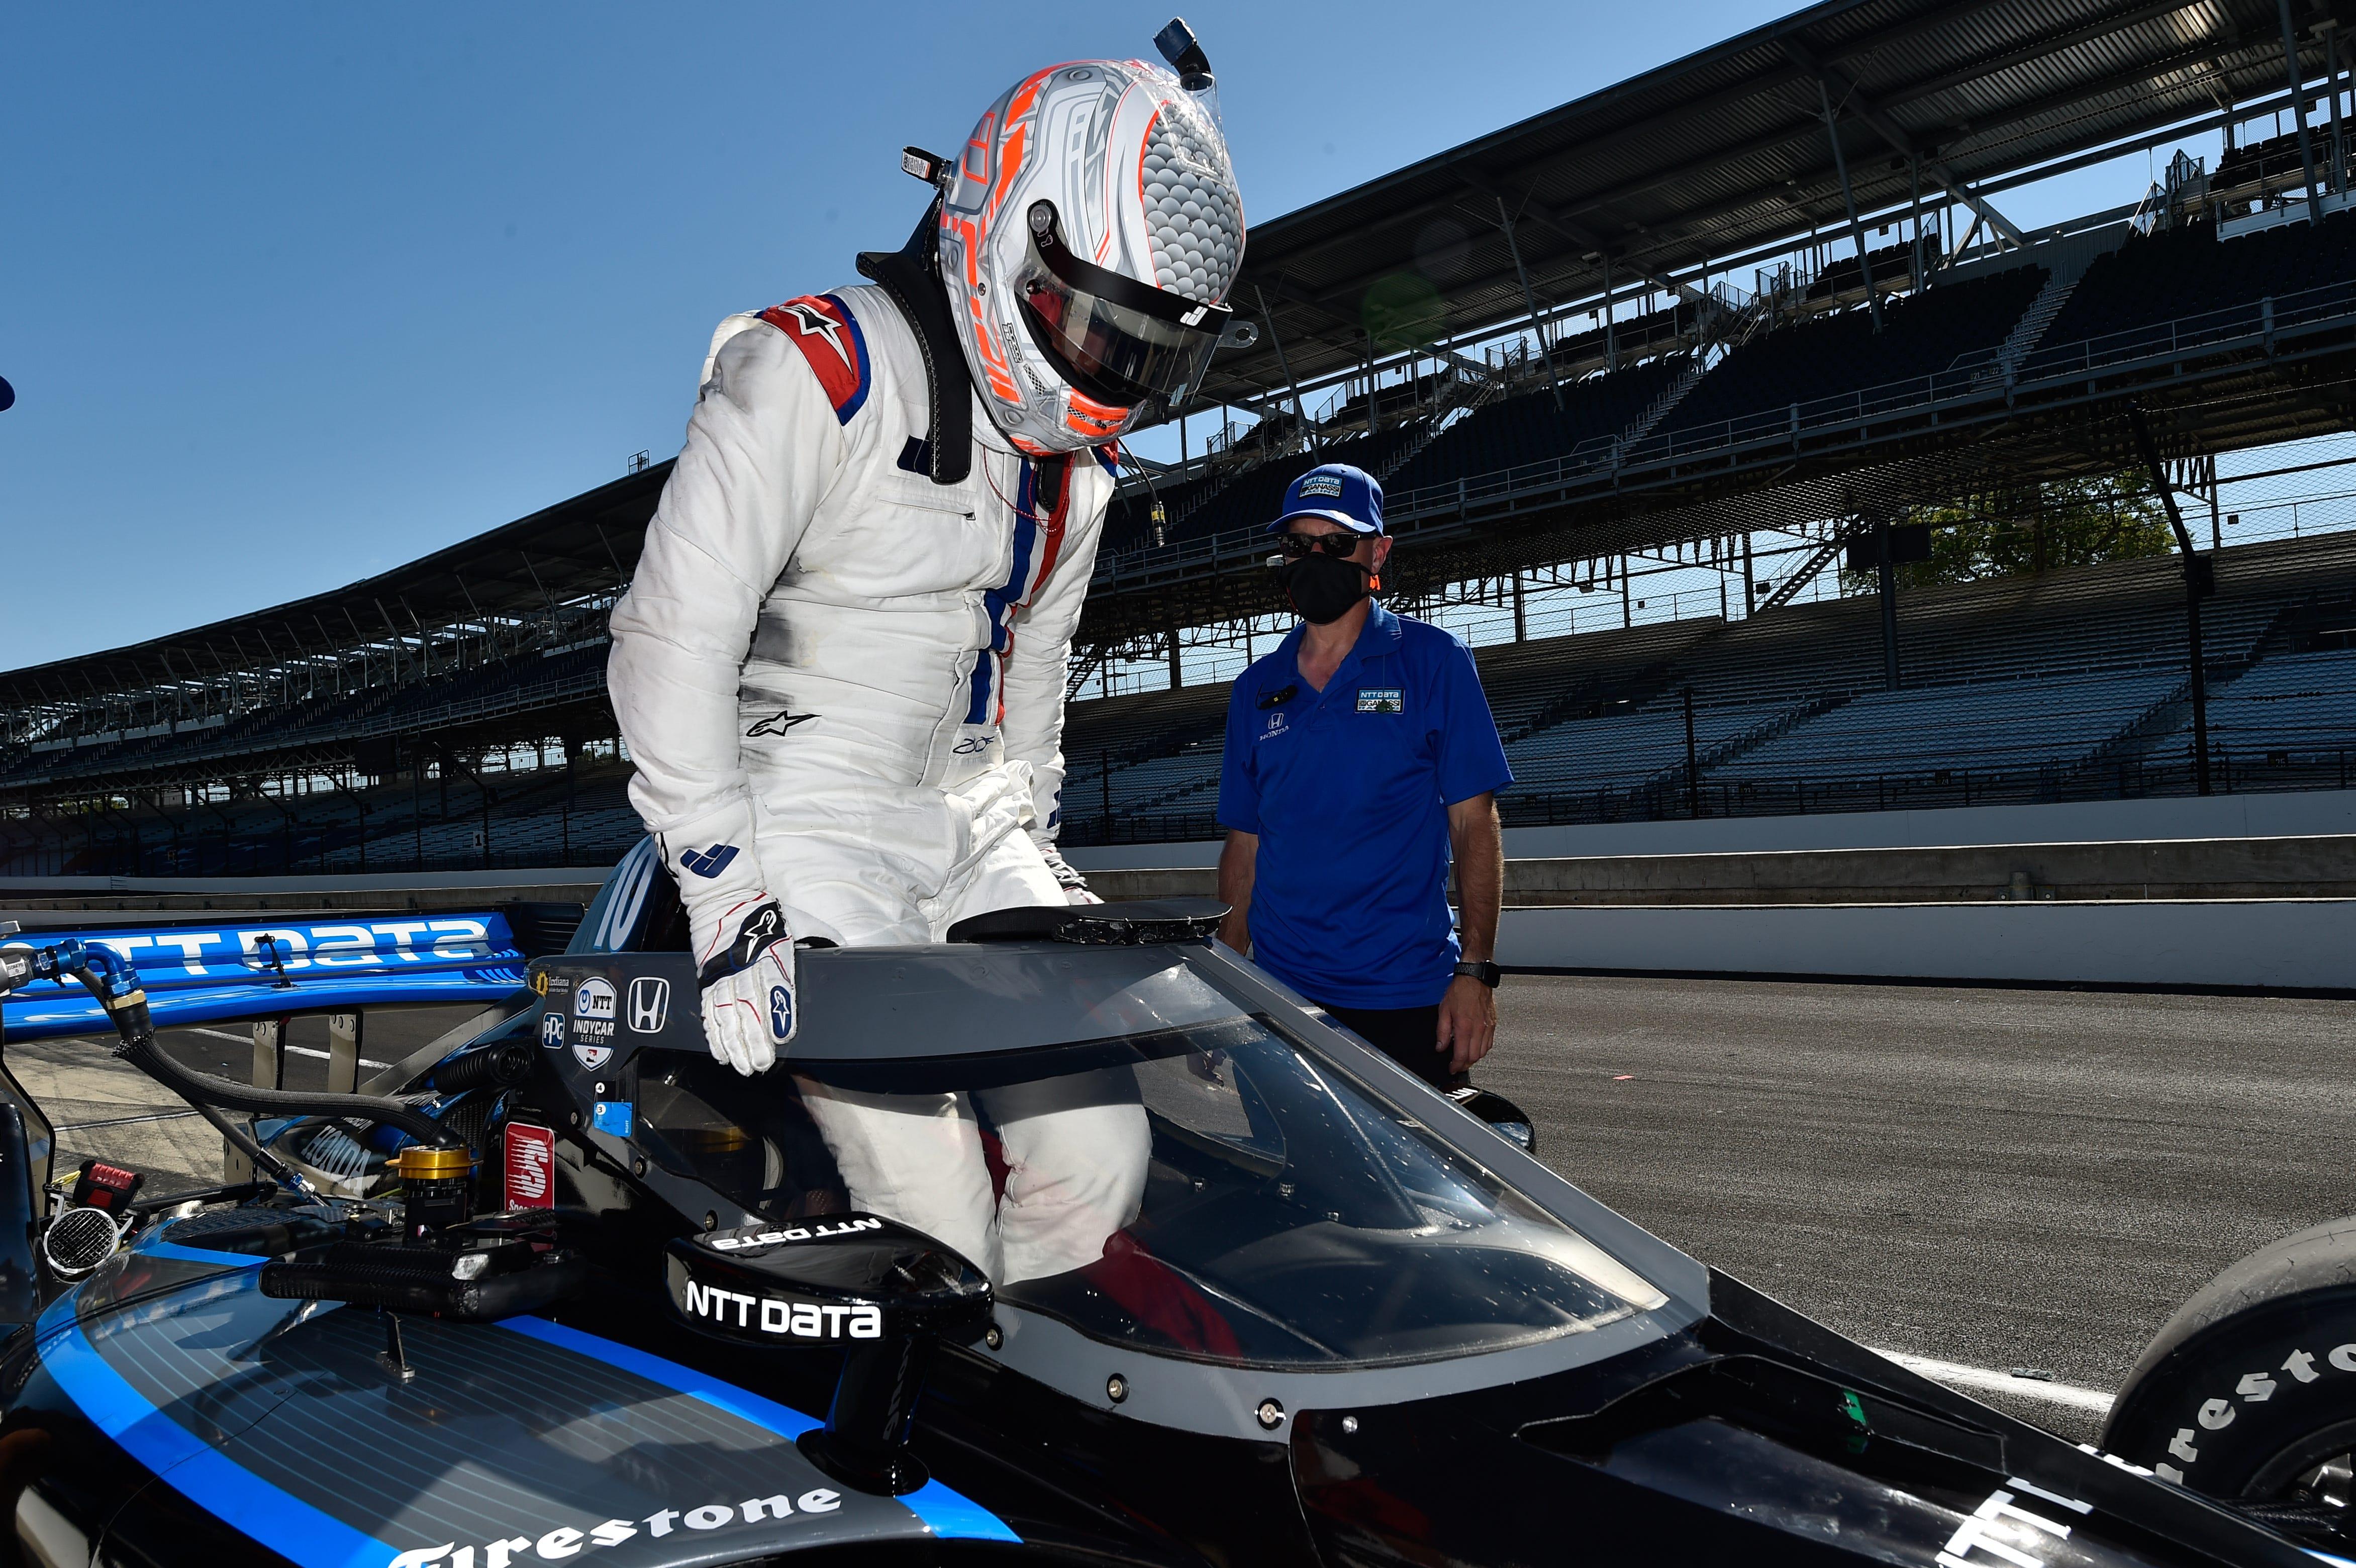 Jimmie Johnson lands Carvana for sponsor on his No. 48 Chip Ganassi Racing car for IndyCar jump